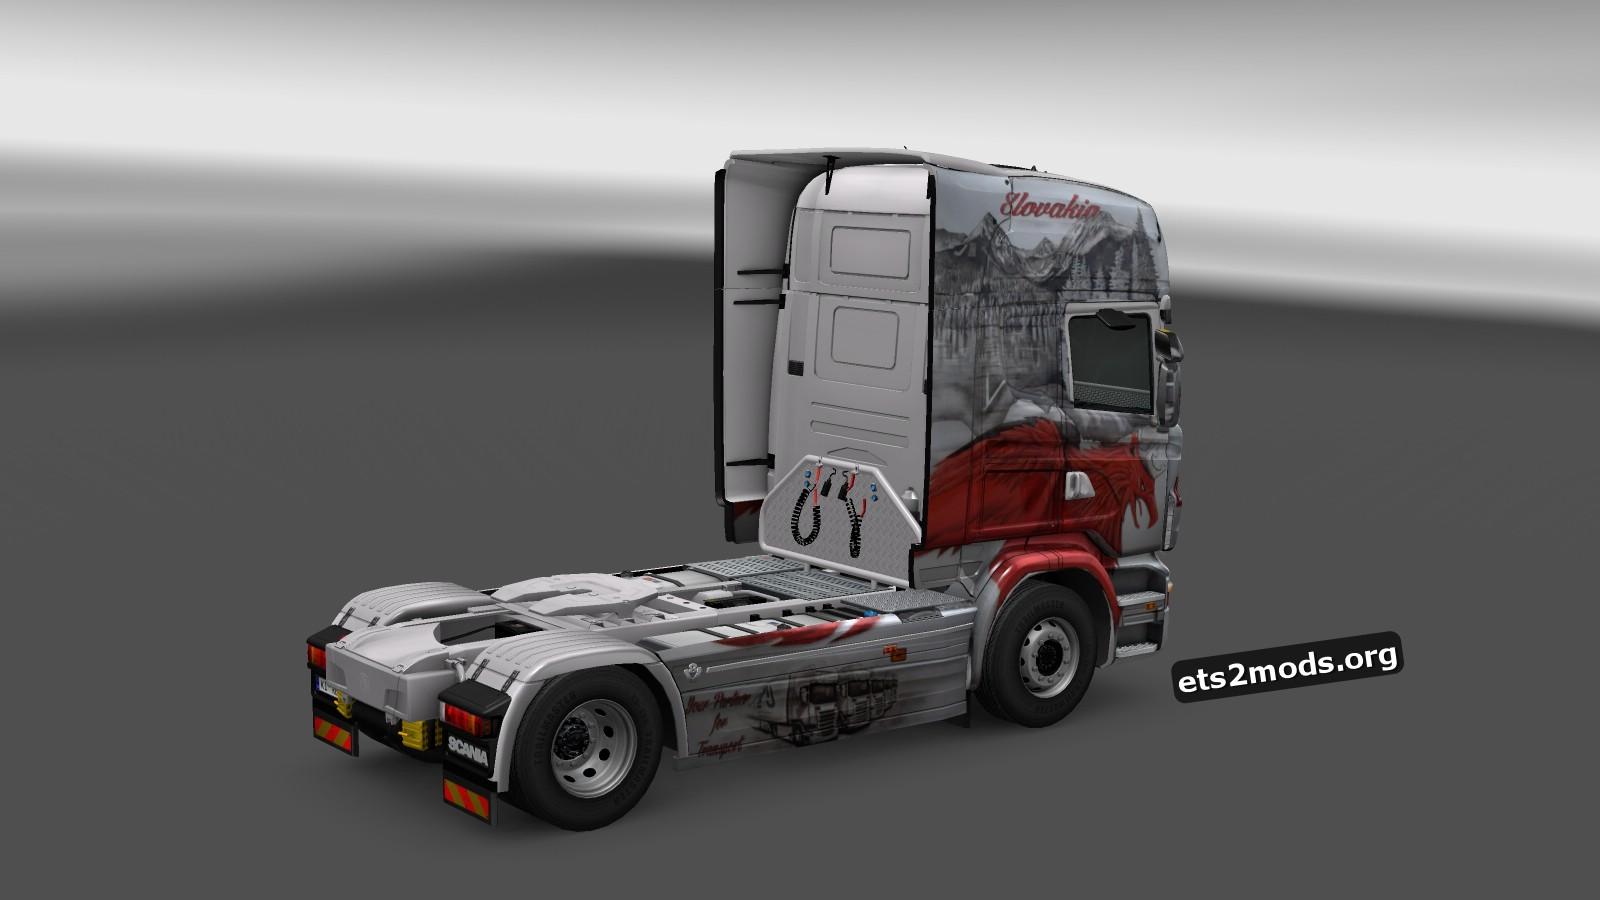 LMJ Lapšanský 25 years Skin for Scania RJL